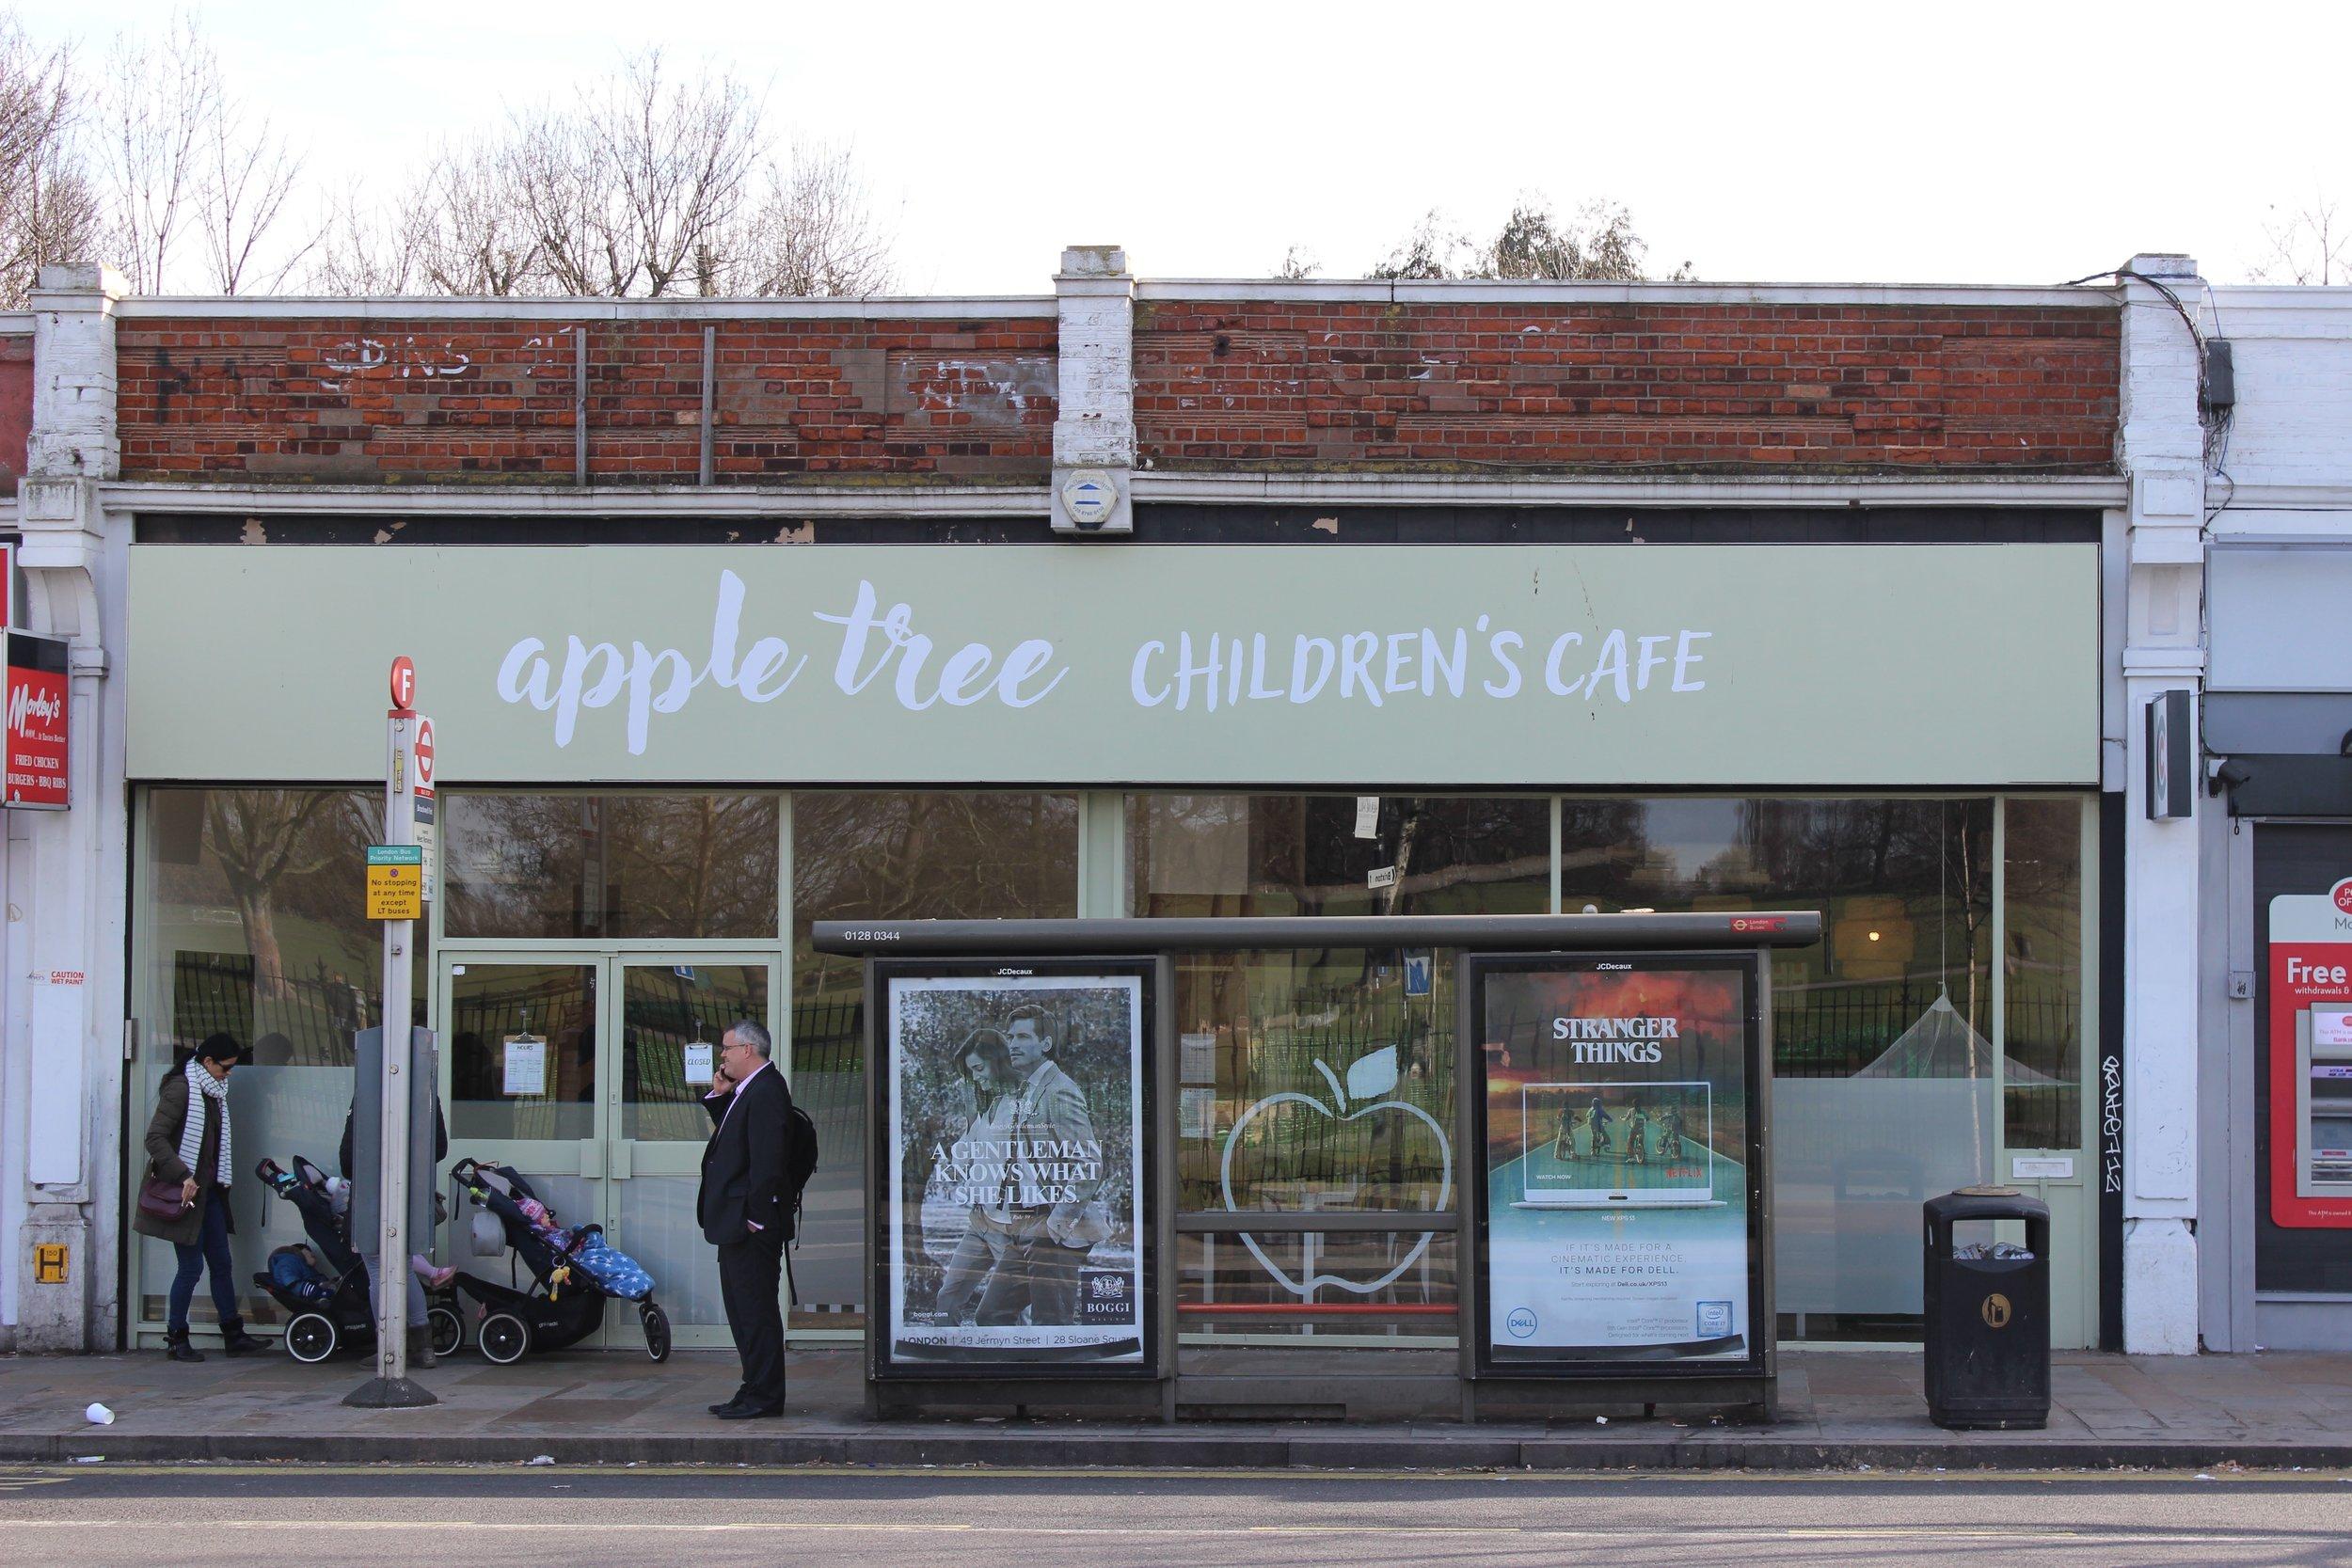 Apple Tree Children's Cafe in Herne Hill South London 24.jpg